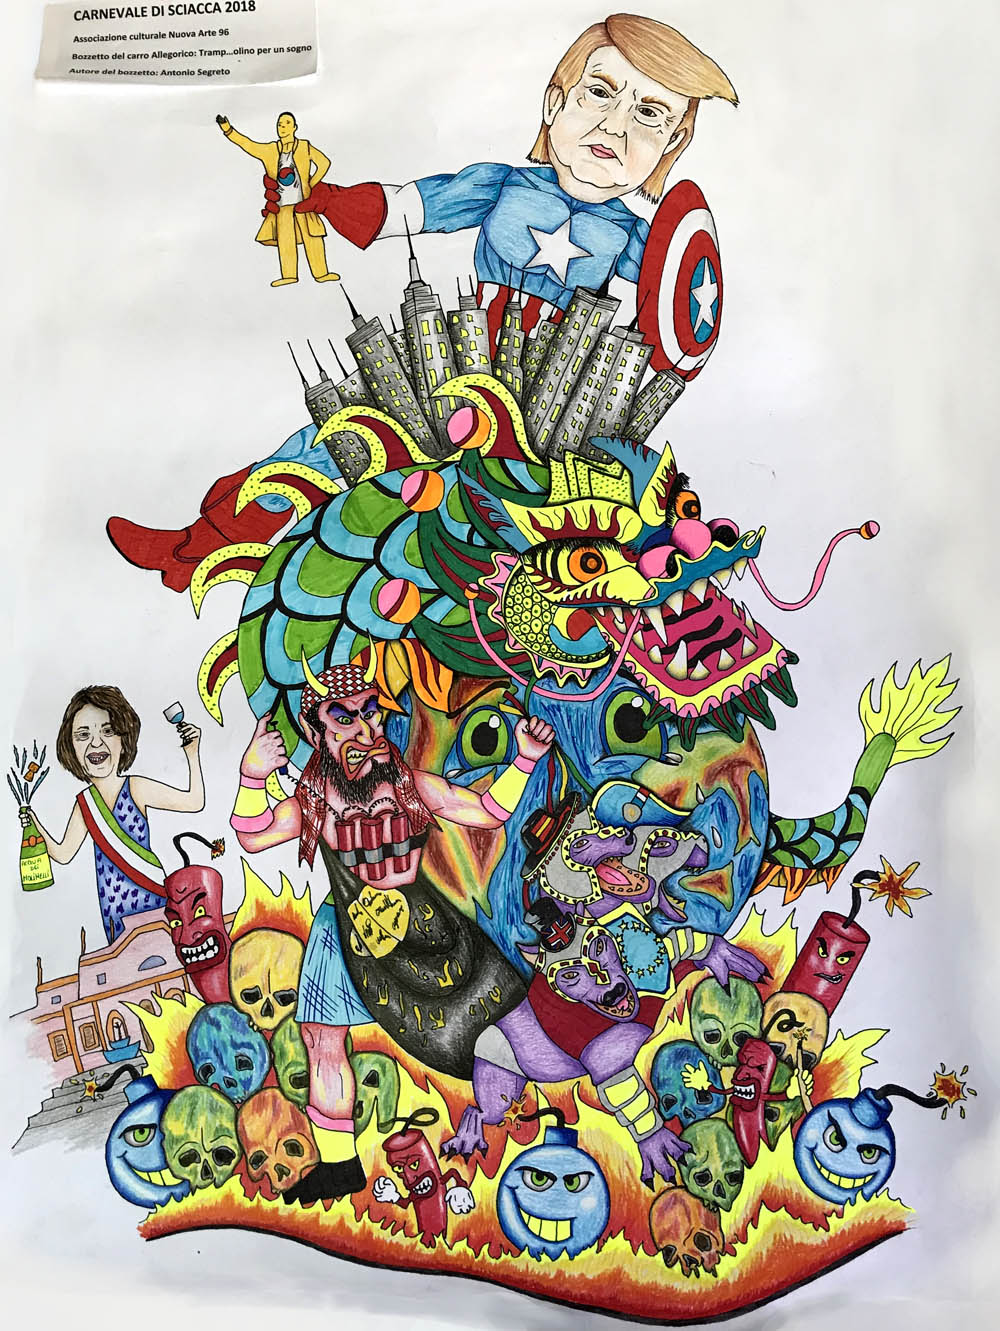 Carnevale di sciacca 2018 i bozzetti dei carri allegorici for Arte arredi sciacca